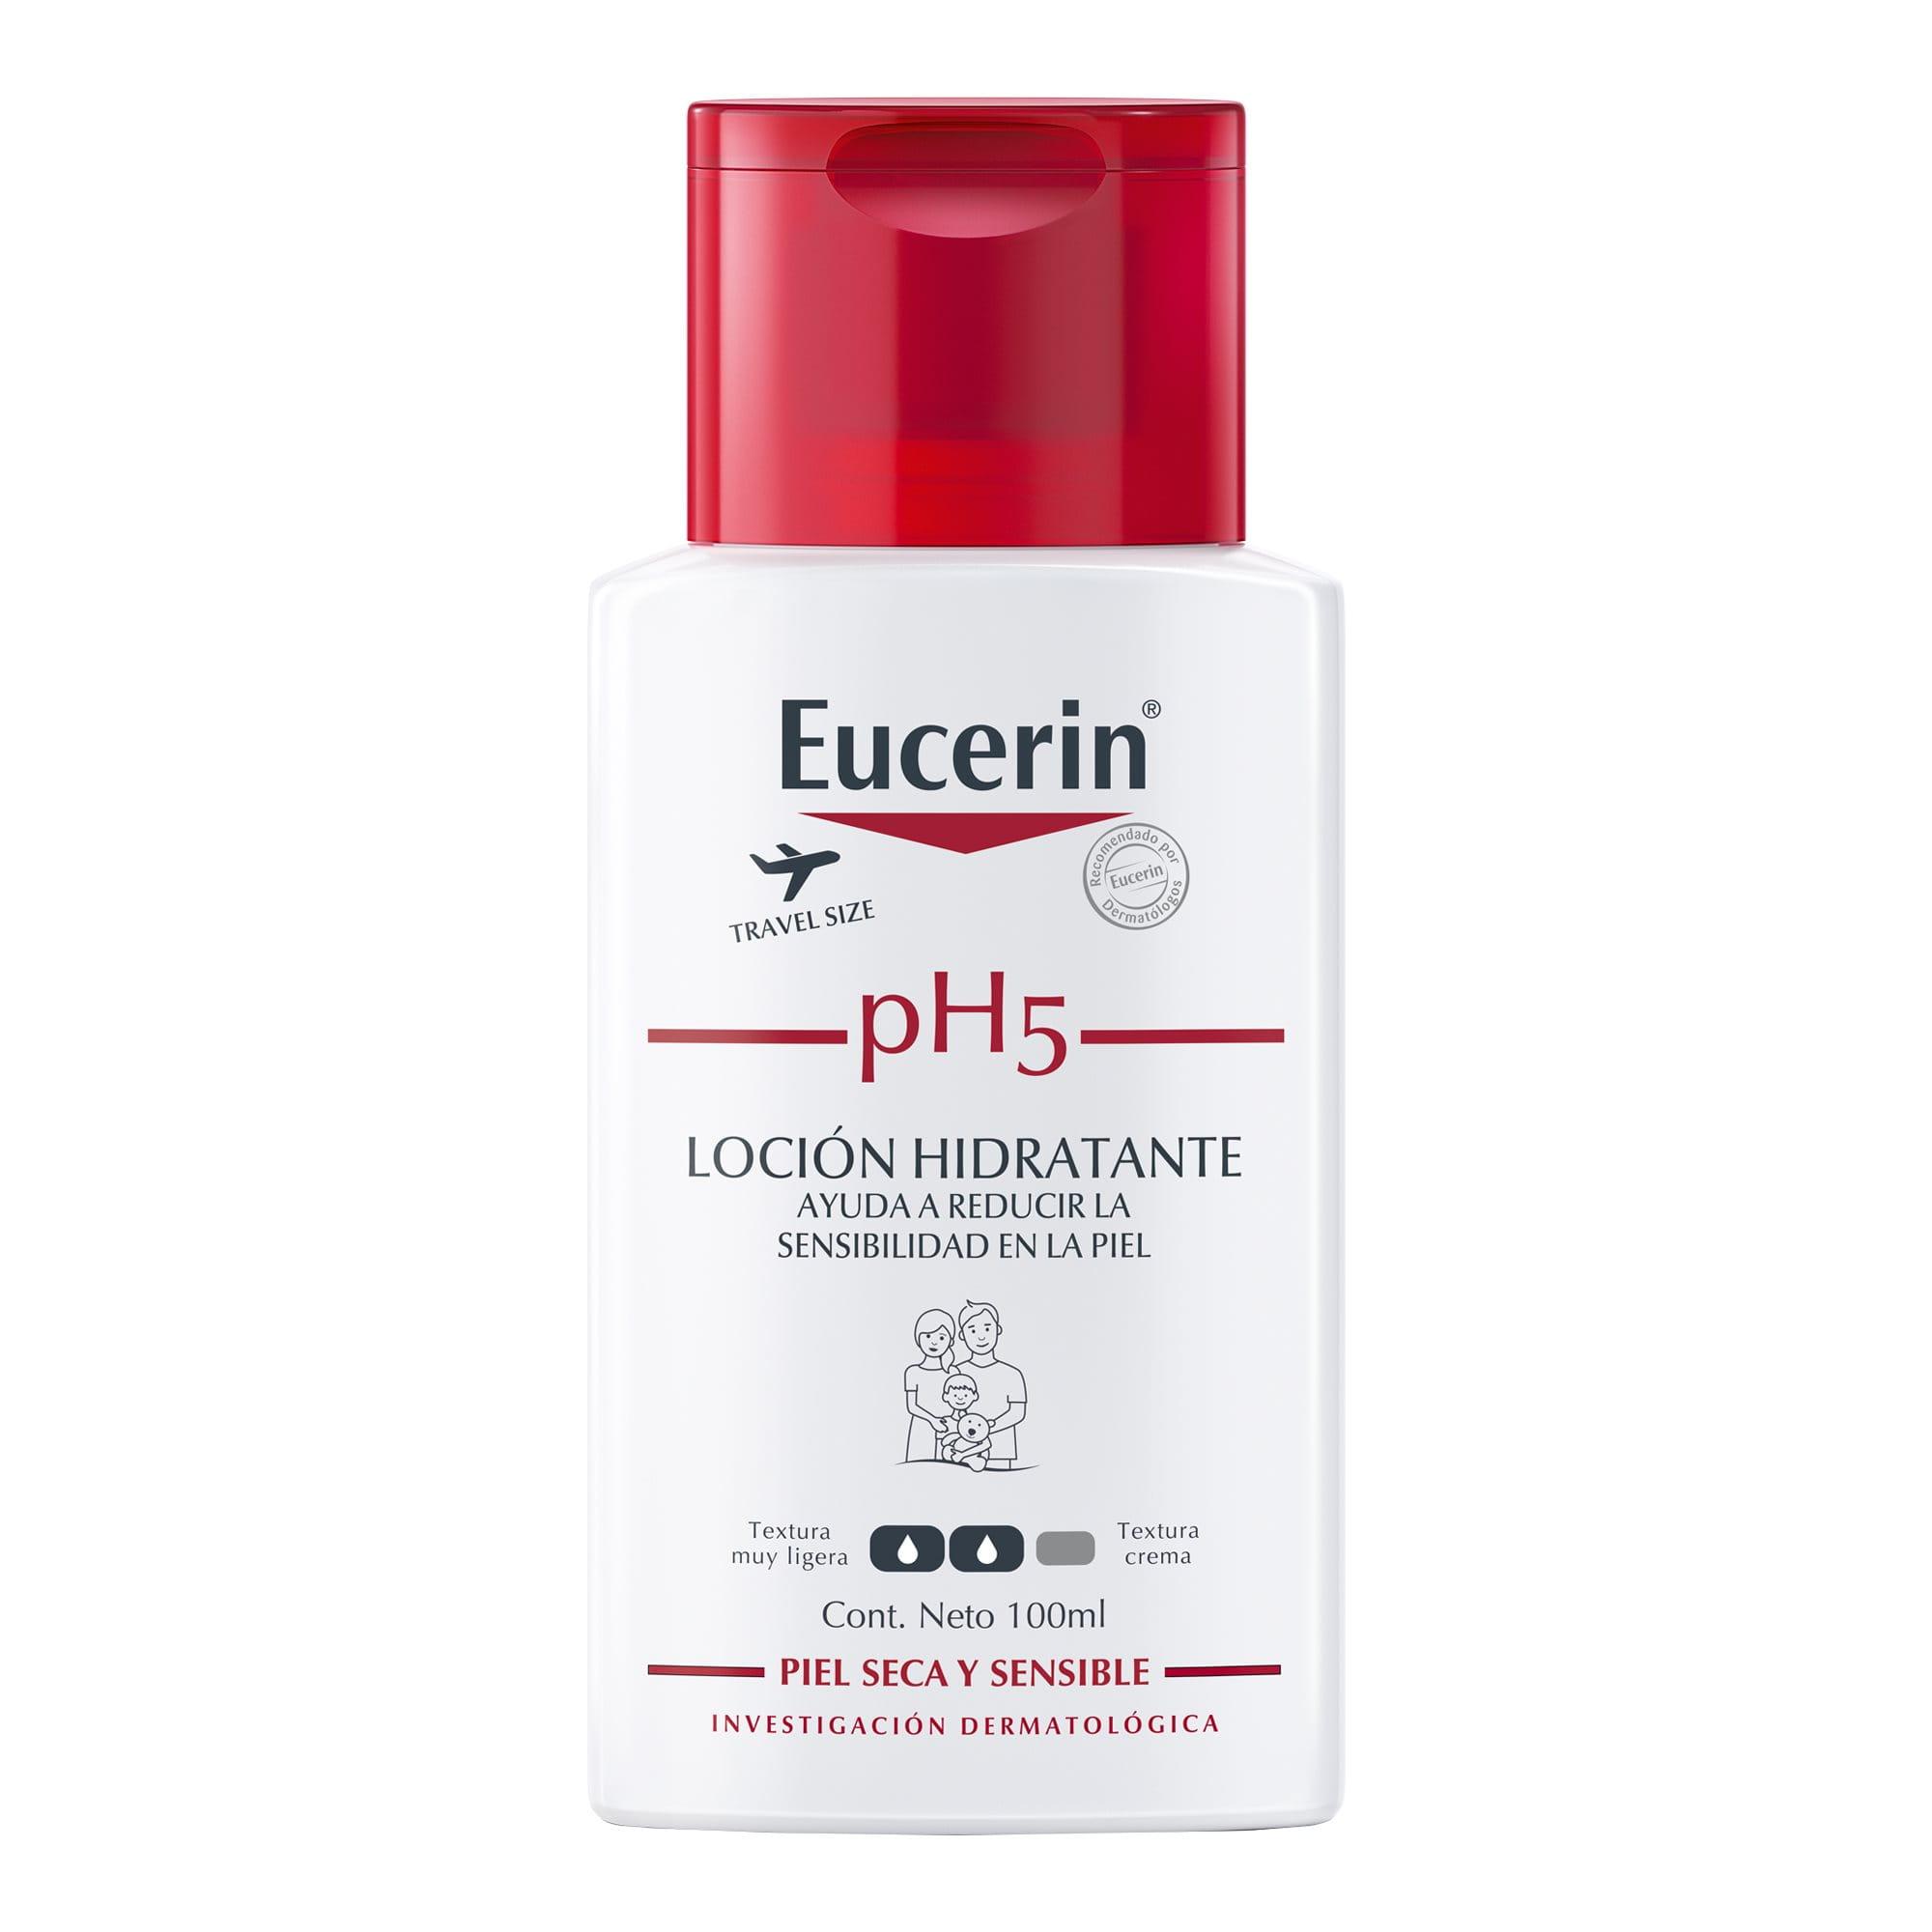 89782_Eucerin-PH5-locion-hidratante-100ml_packshot